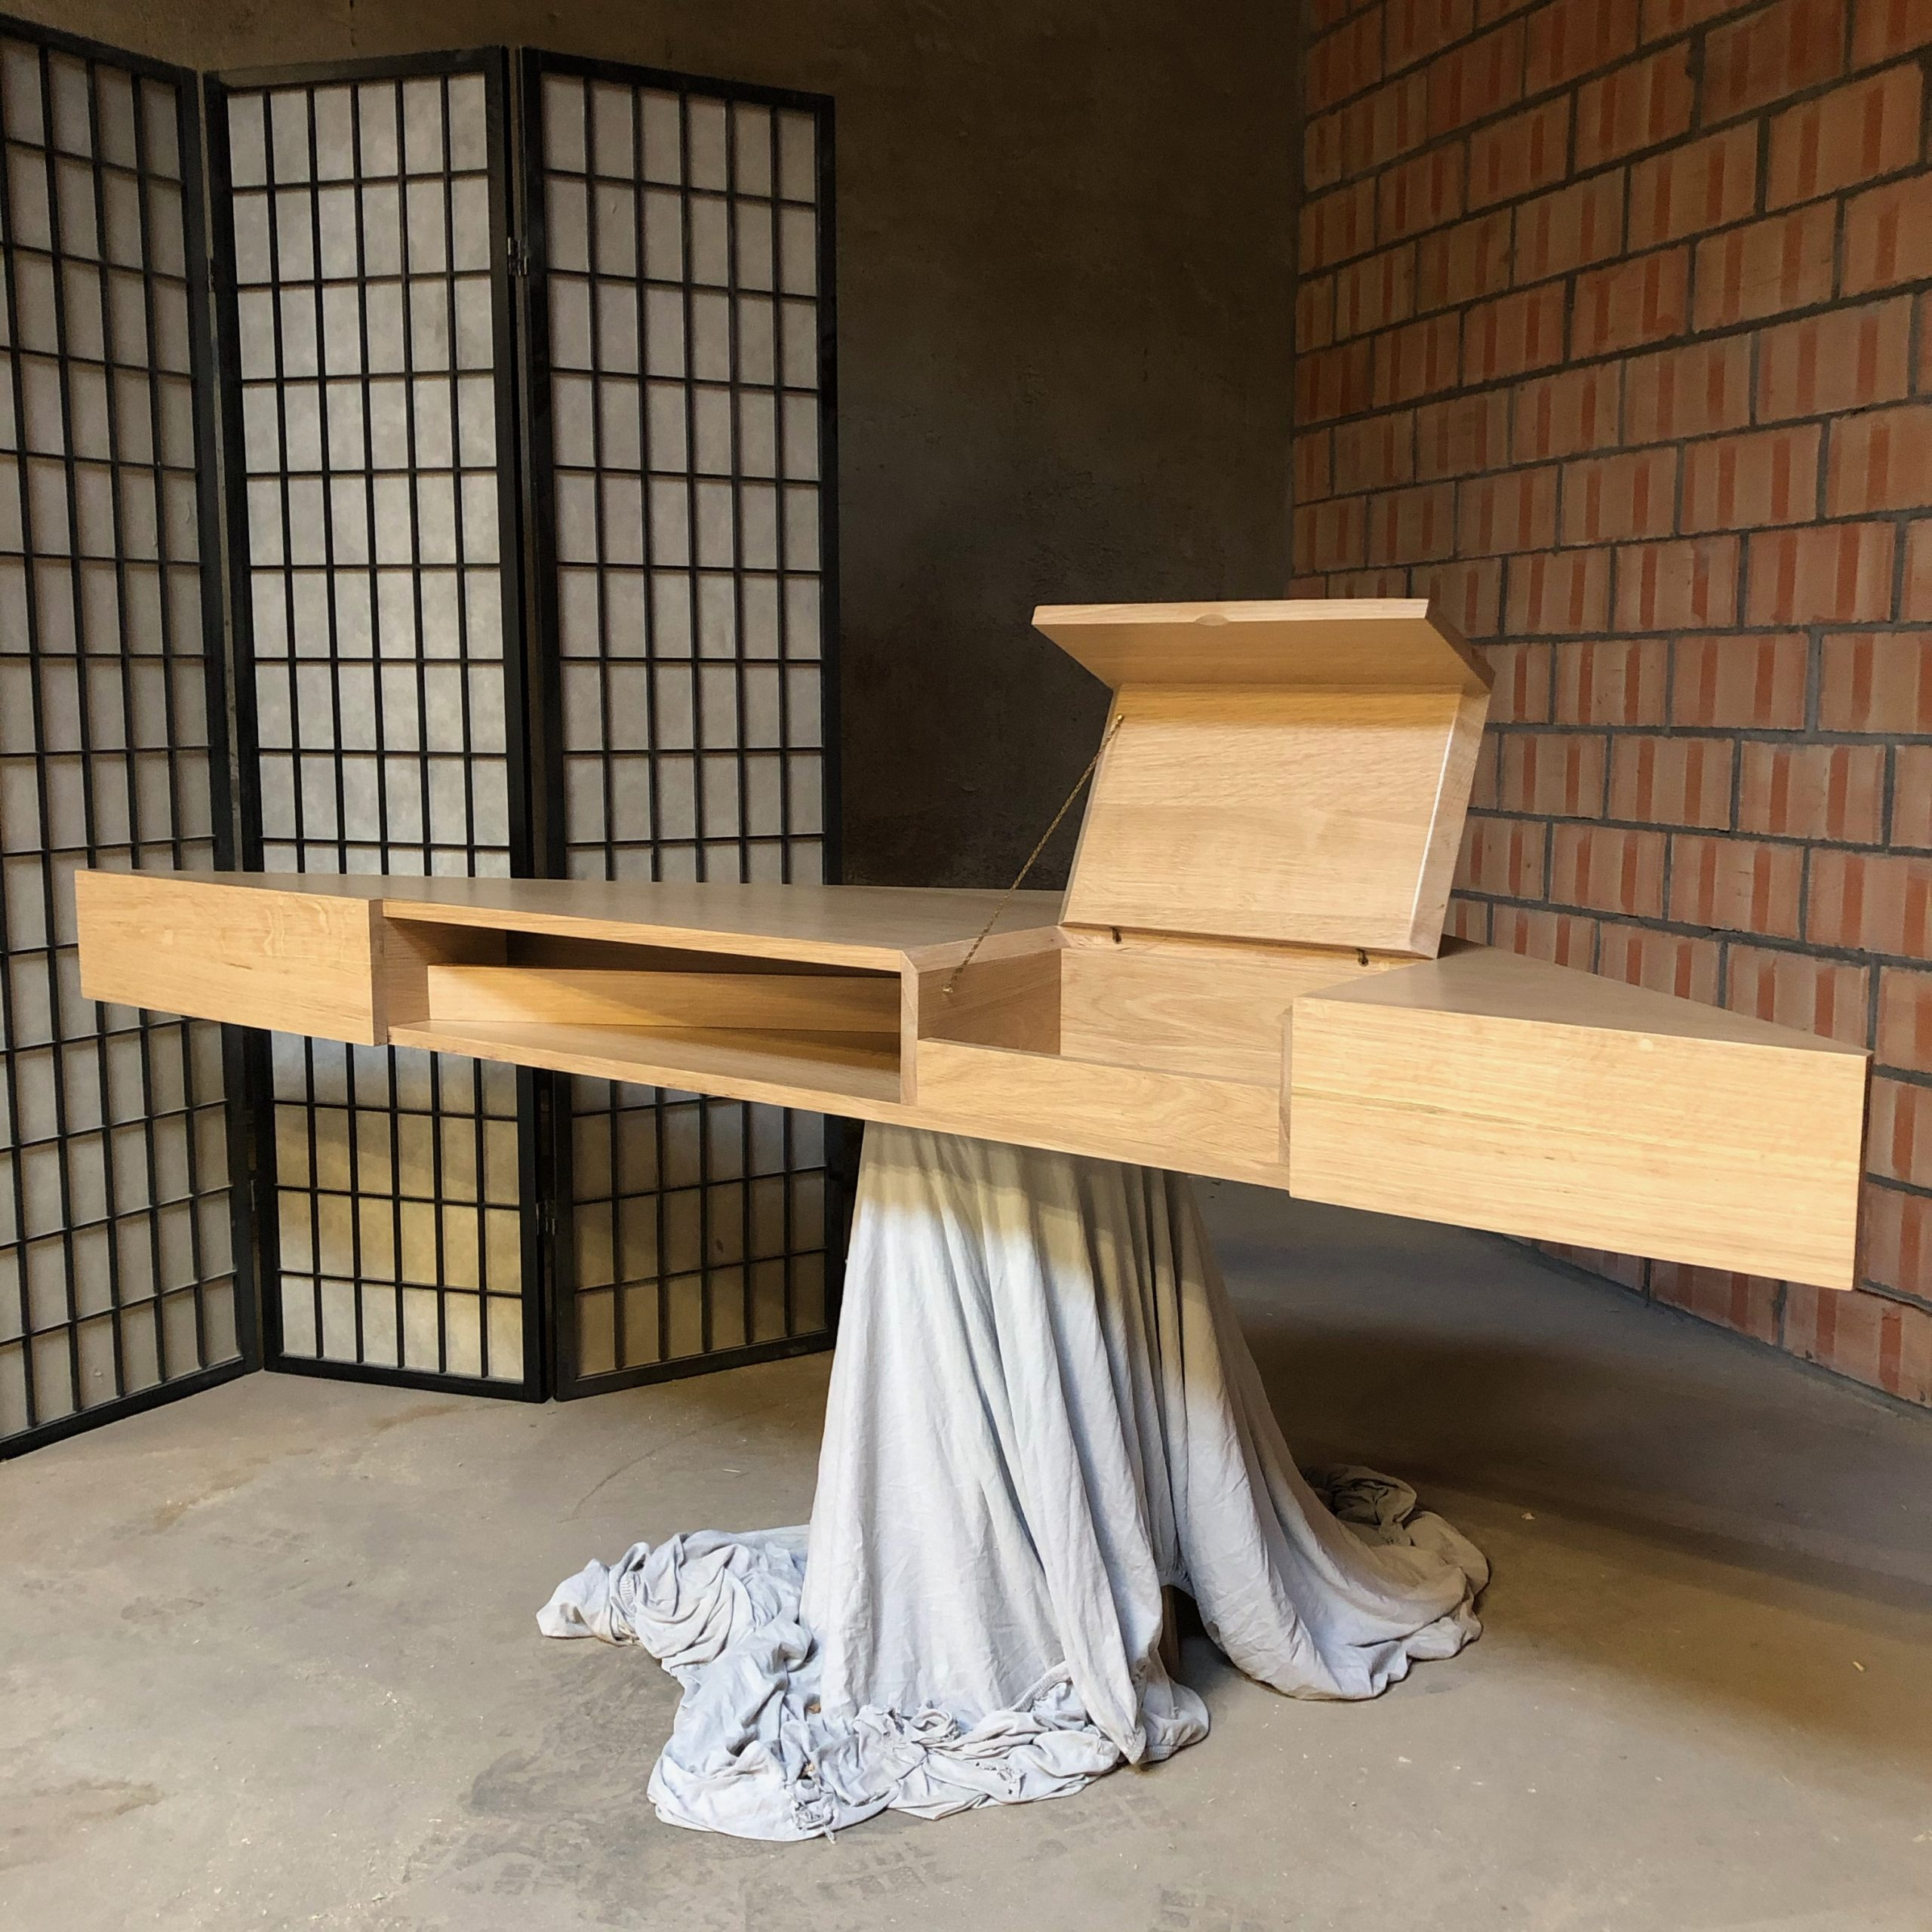 Desk & cupboard B.B. – 11/2020